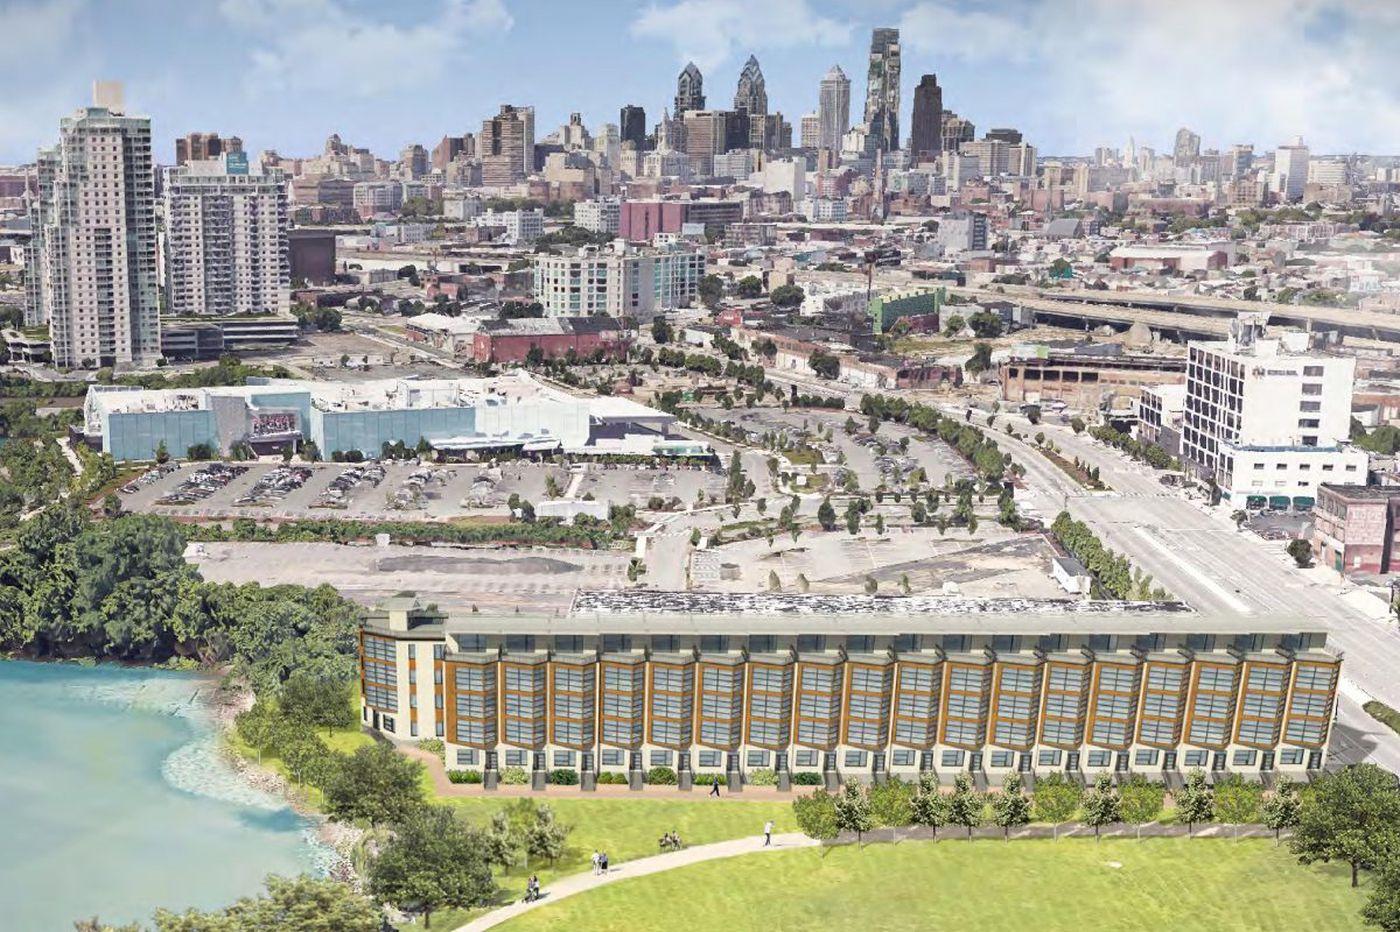 Riverfront townhouse project near SugarHouse sold to NY developer